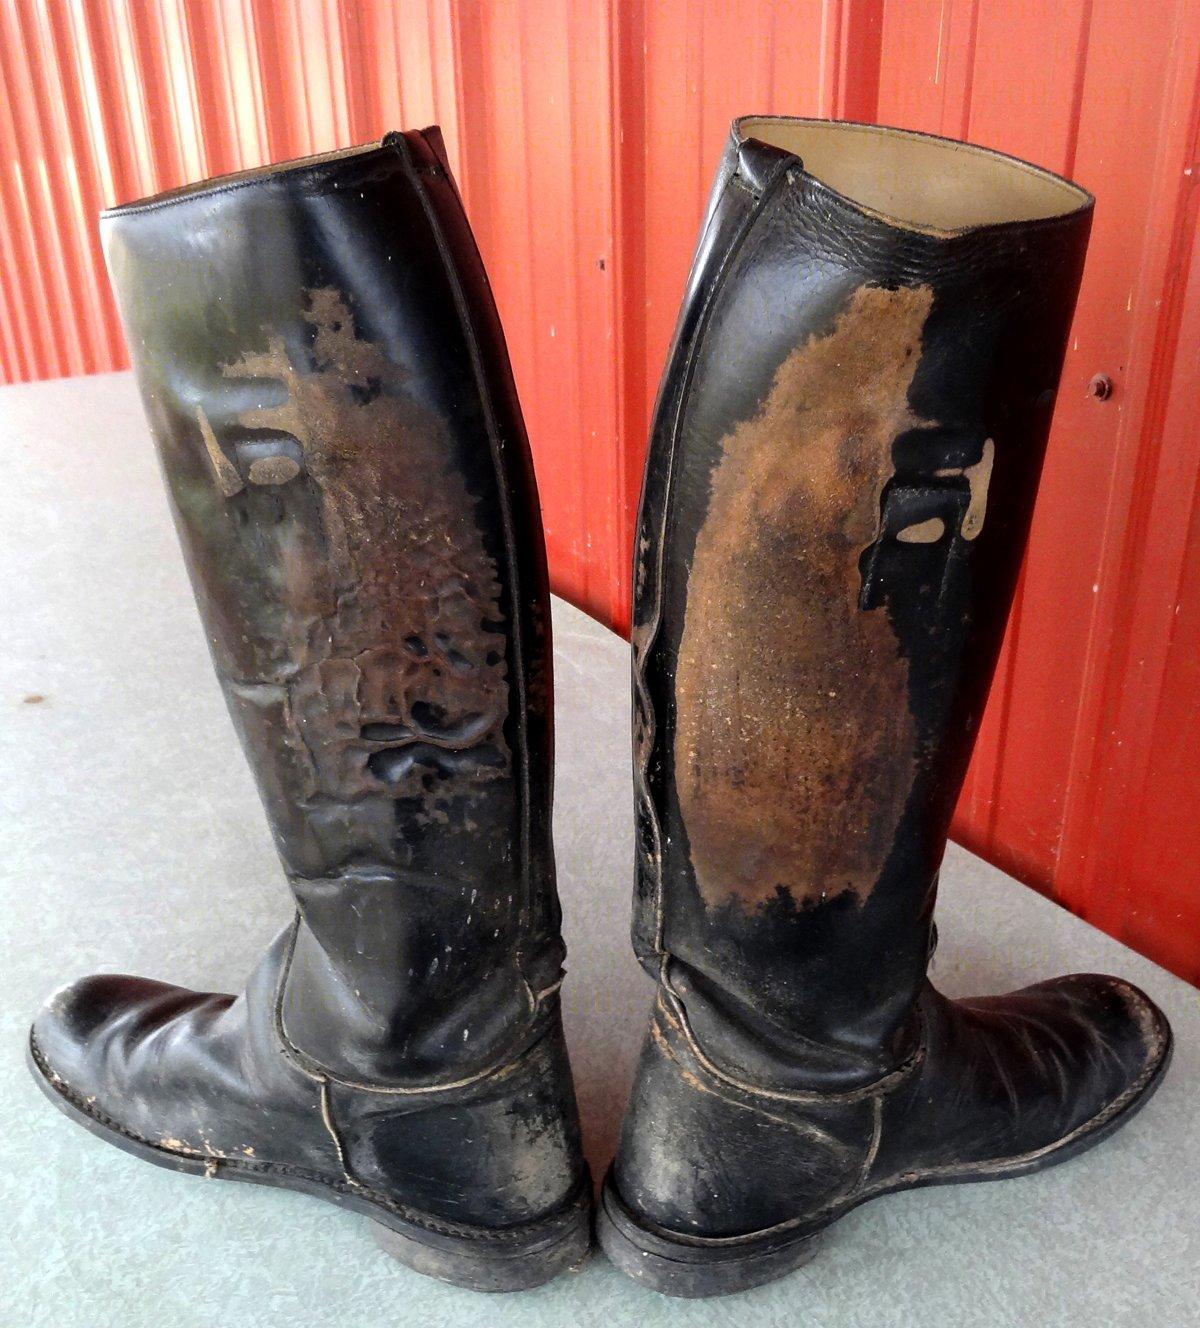 Restoring a Beautiful Finish on Worn Leather Goods - Hawk Hill